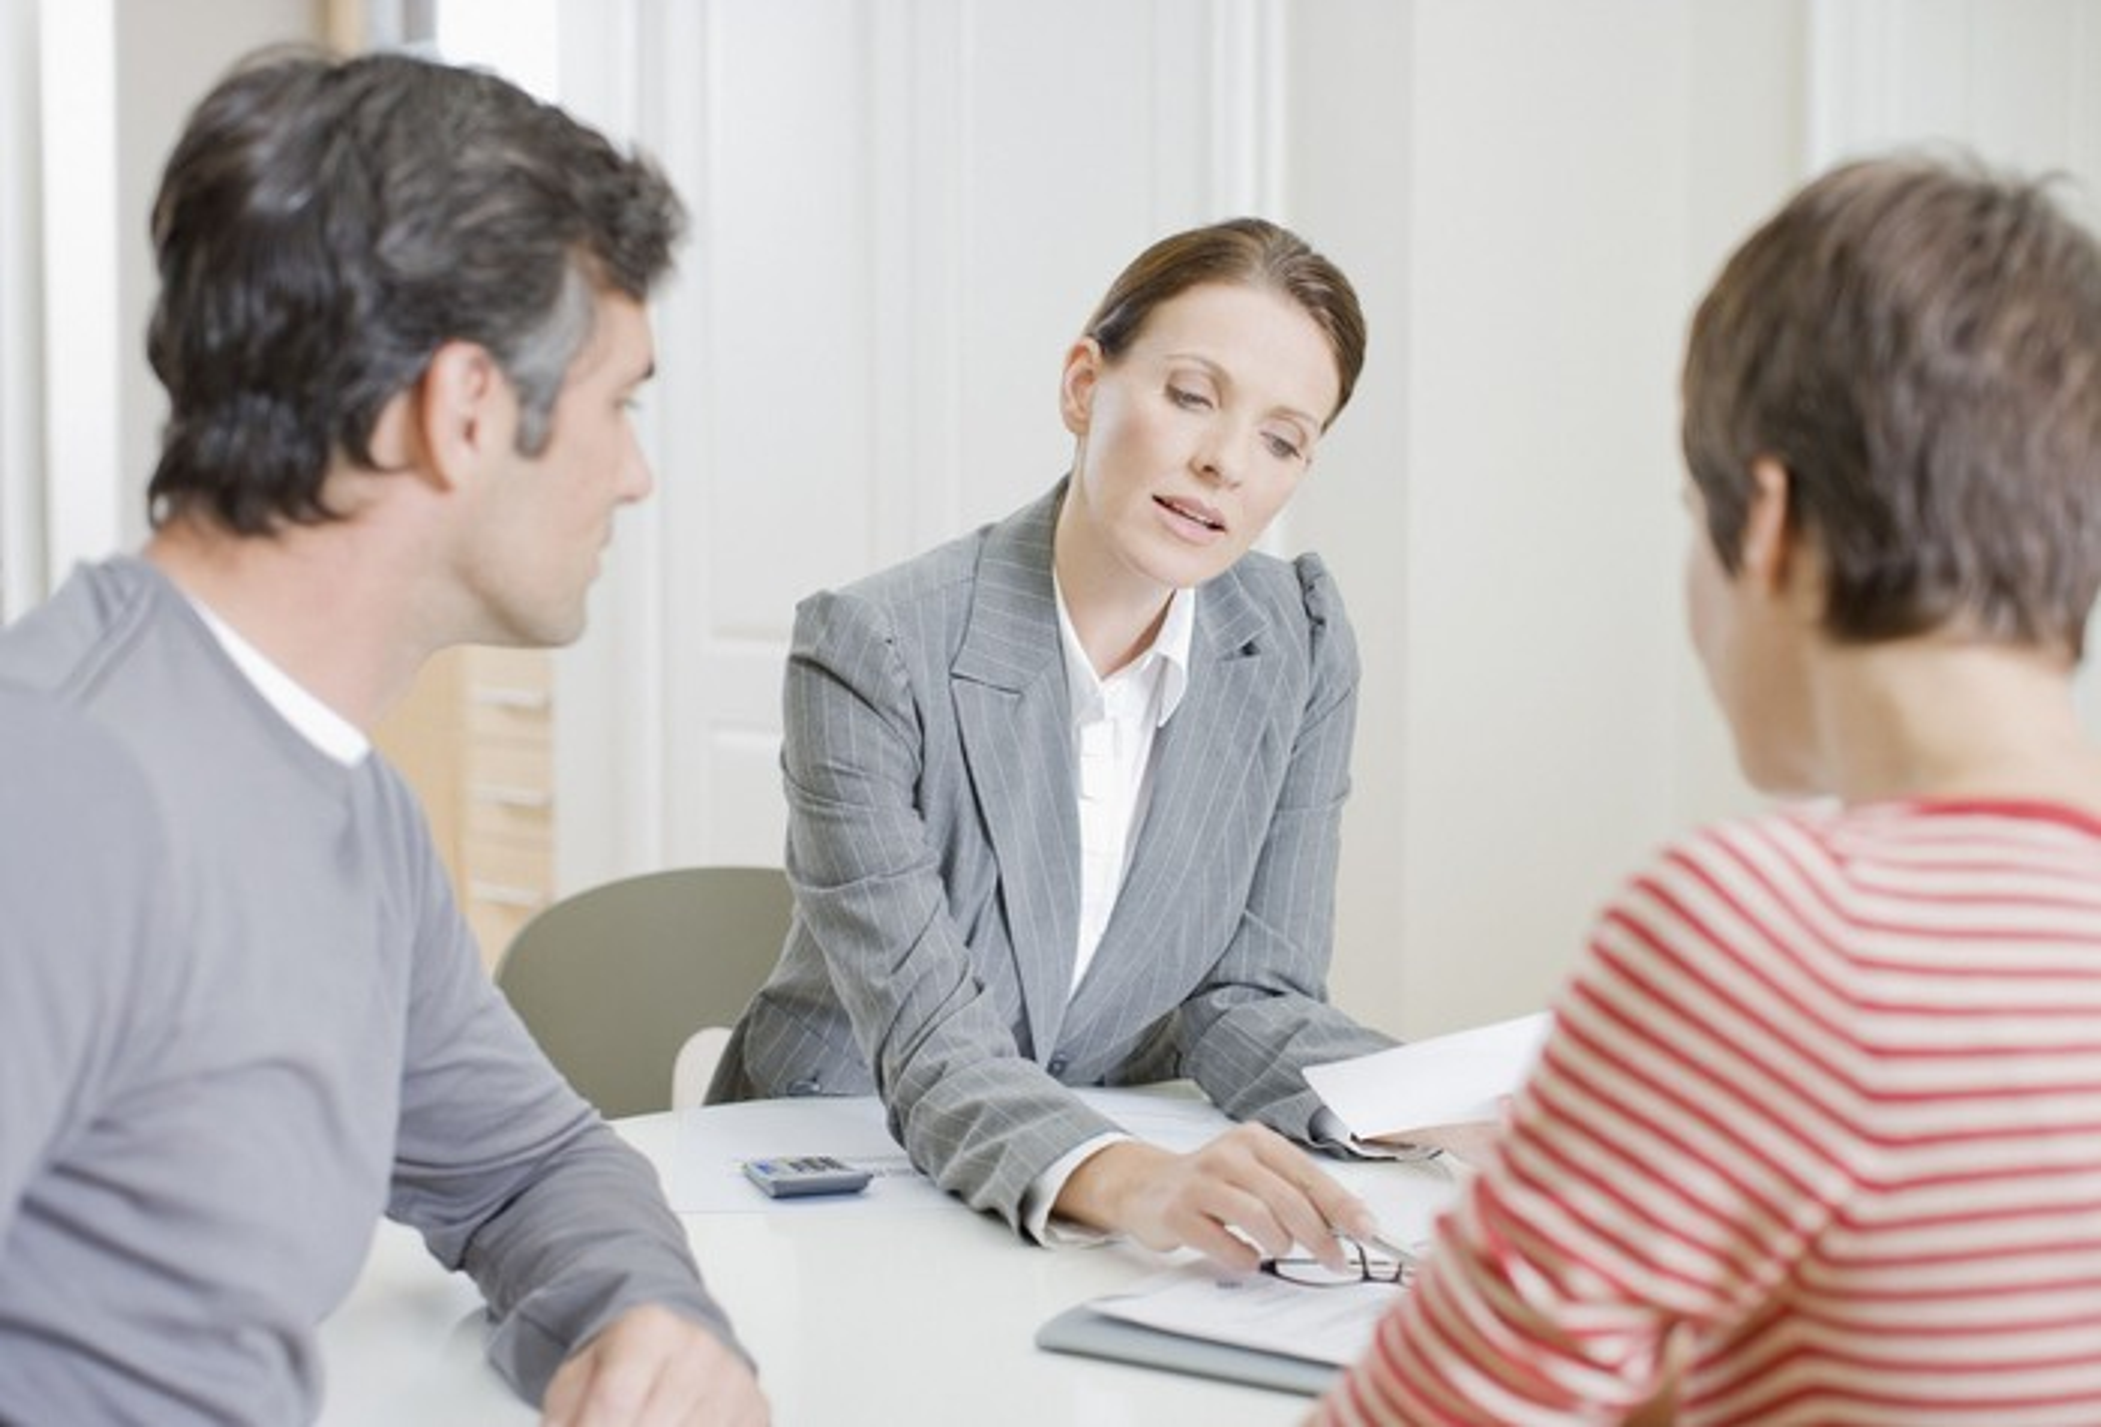 professional woman explaining documents